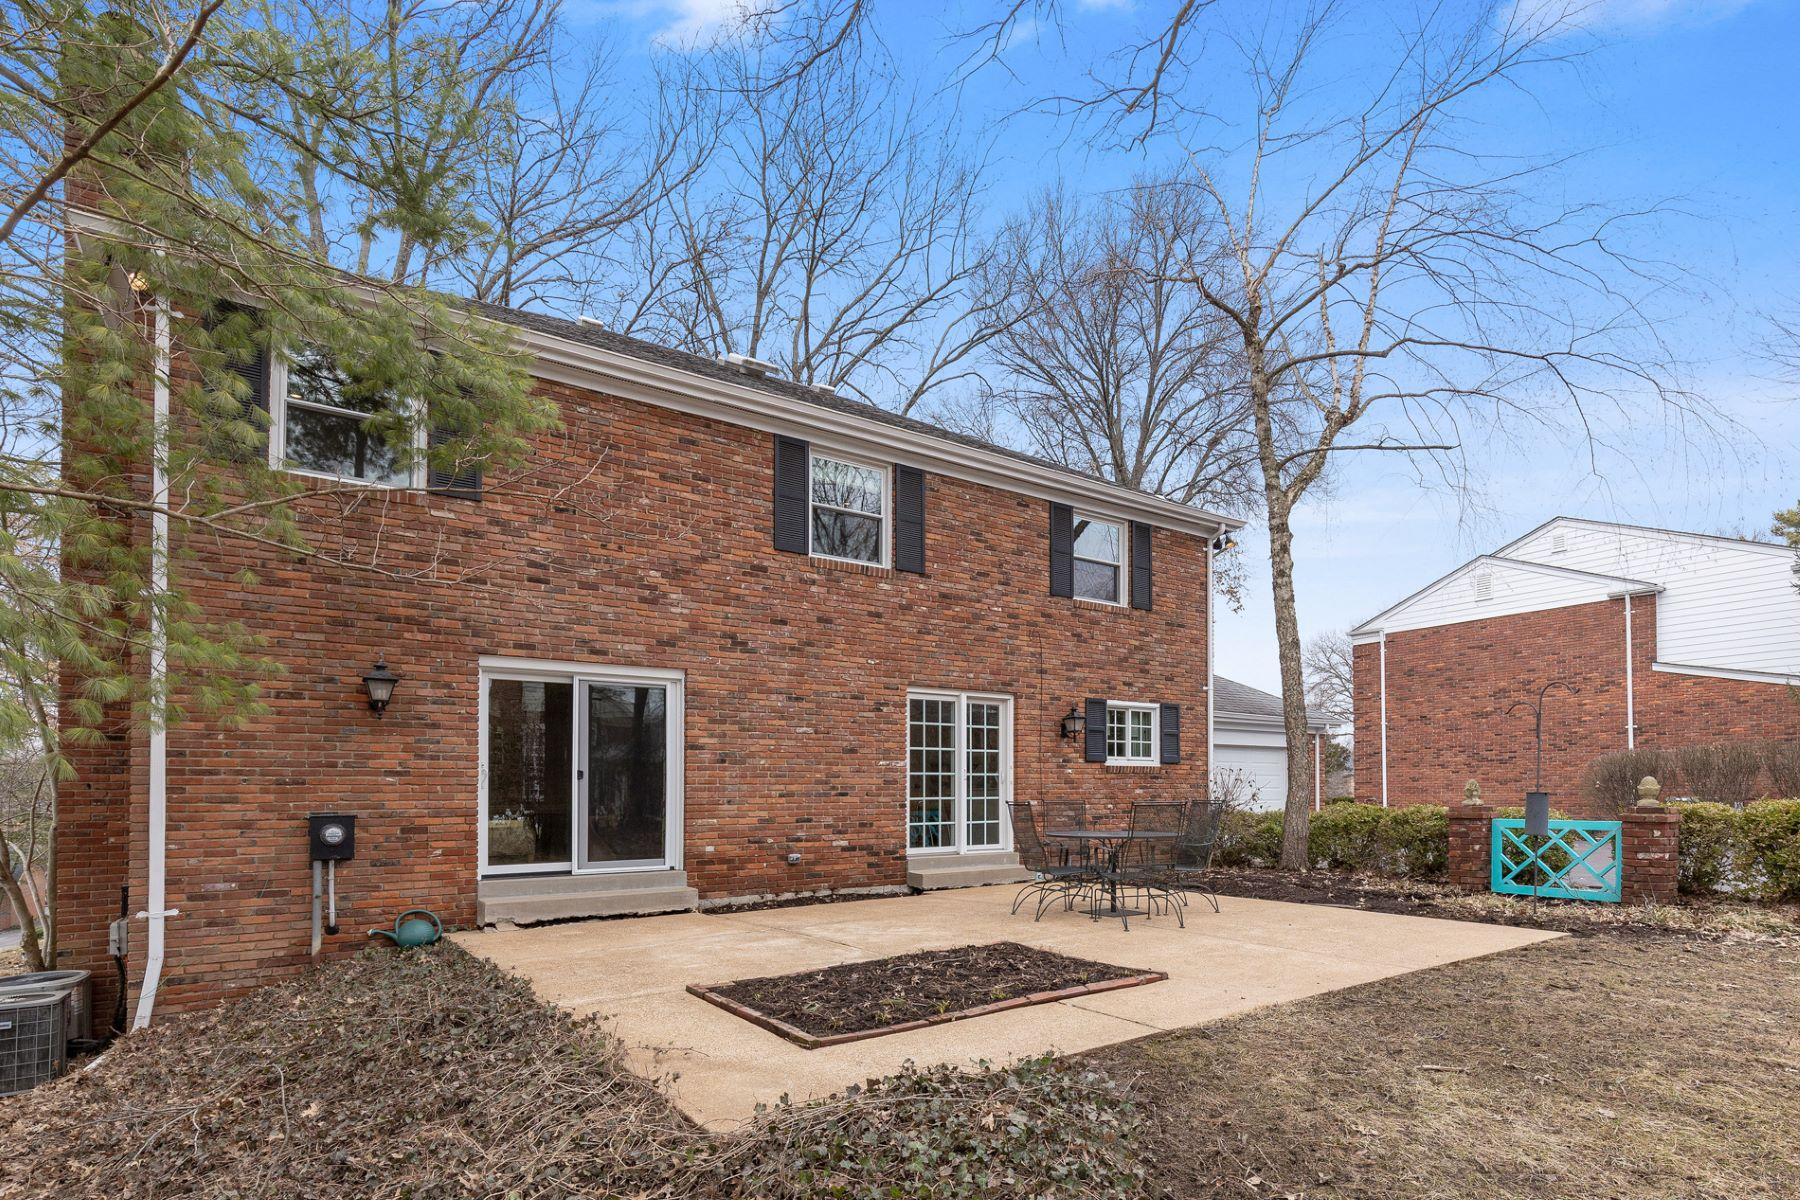 Additional photo for property listing at Granada Way 34 Granada Way Ladue, Missouri 63124 United States